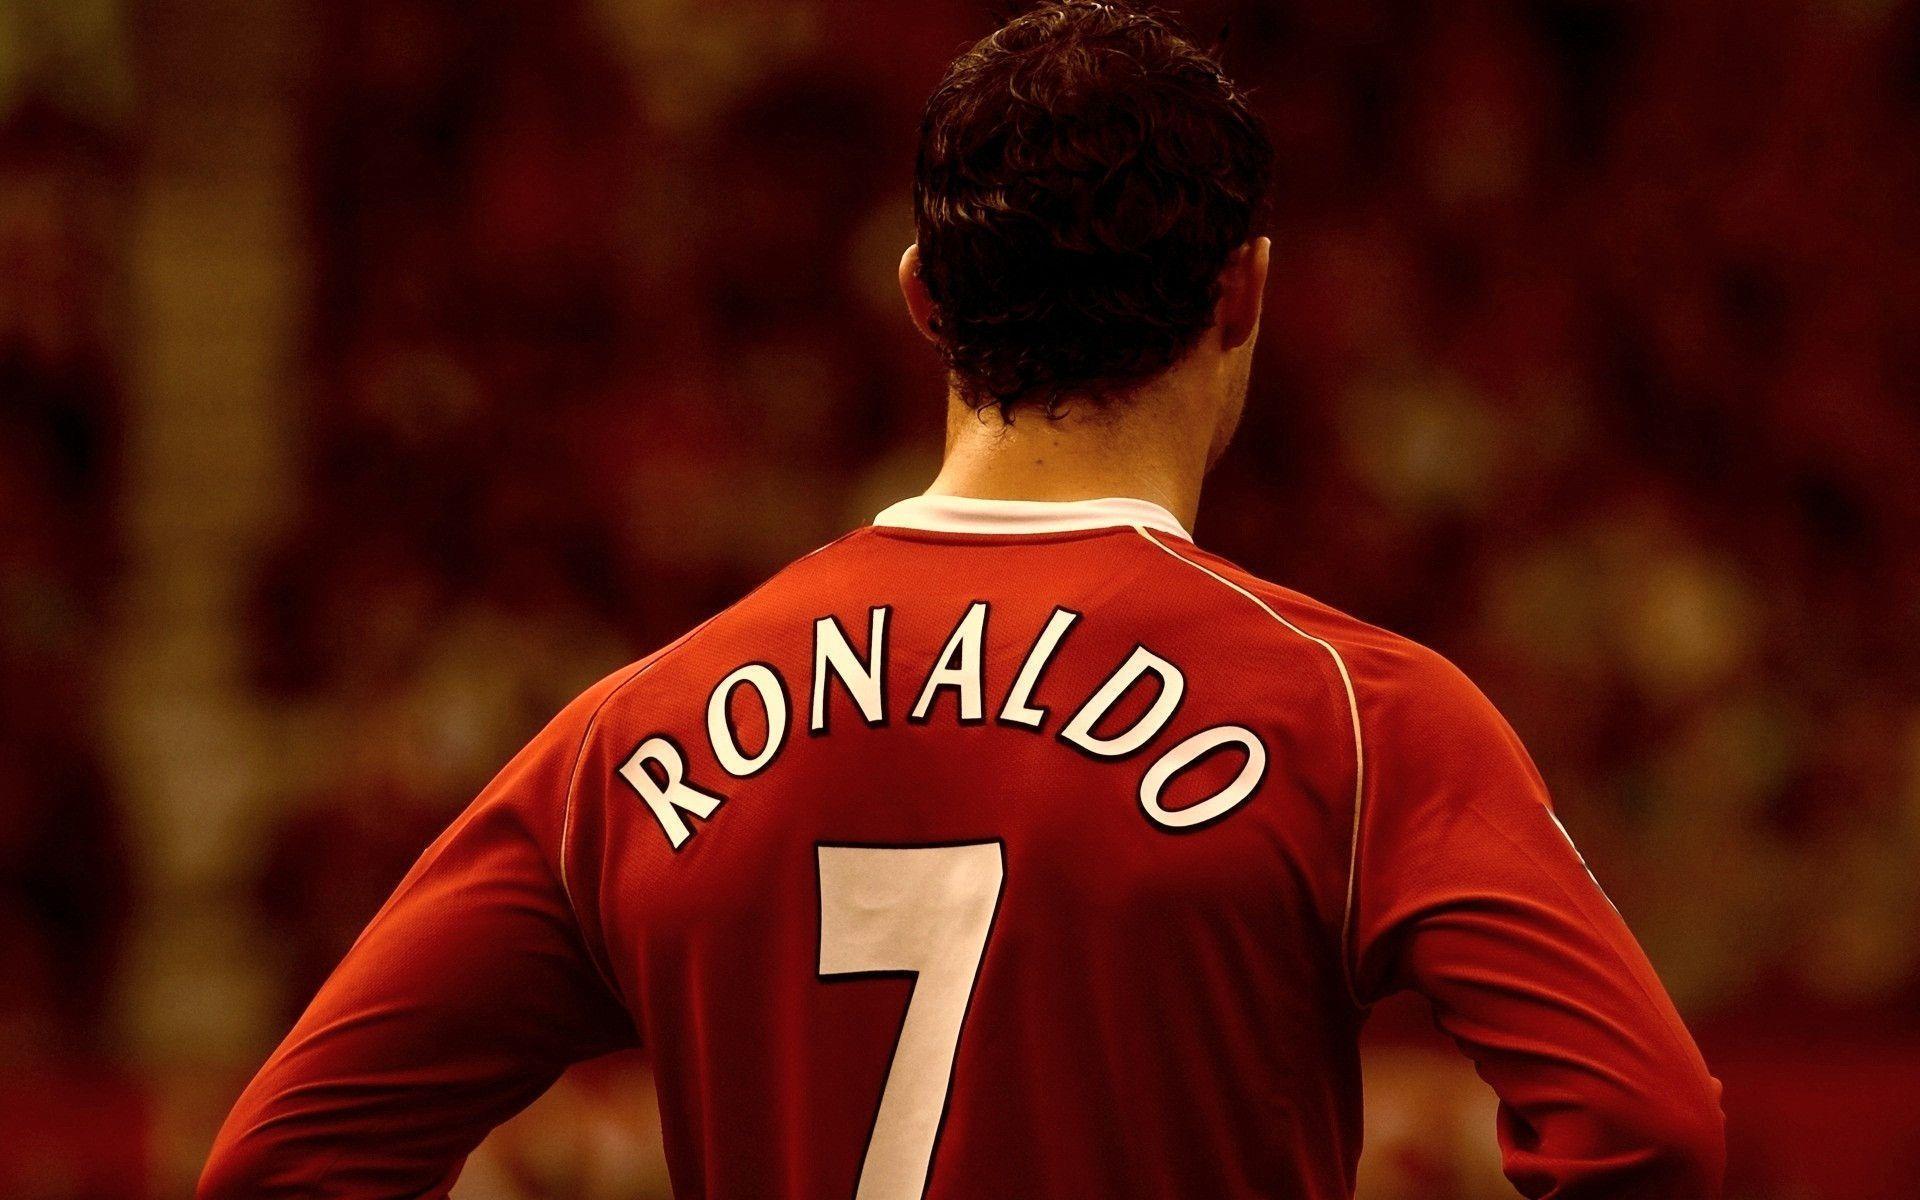 Cristiano Ronaldo Wallpapers | HD Wallpapers